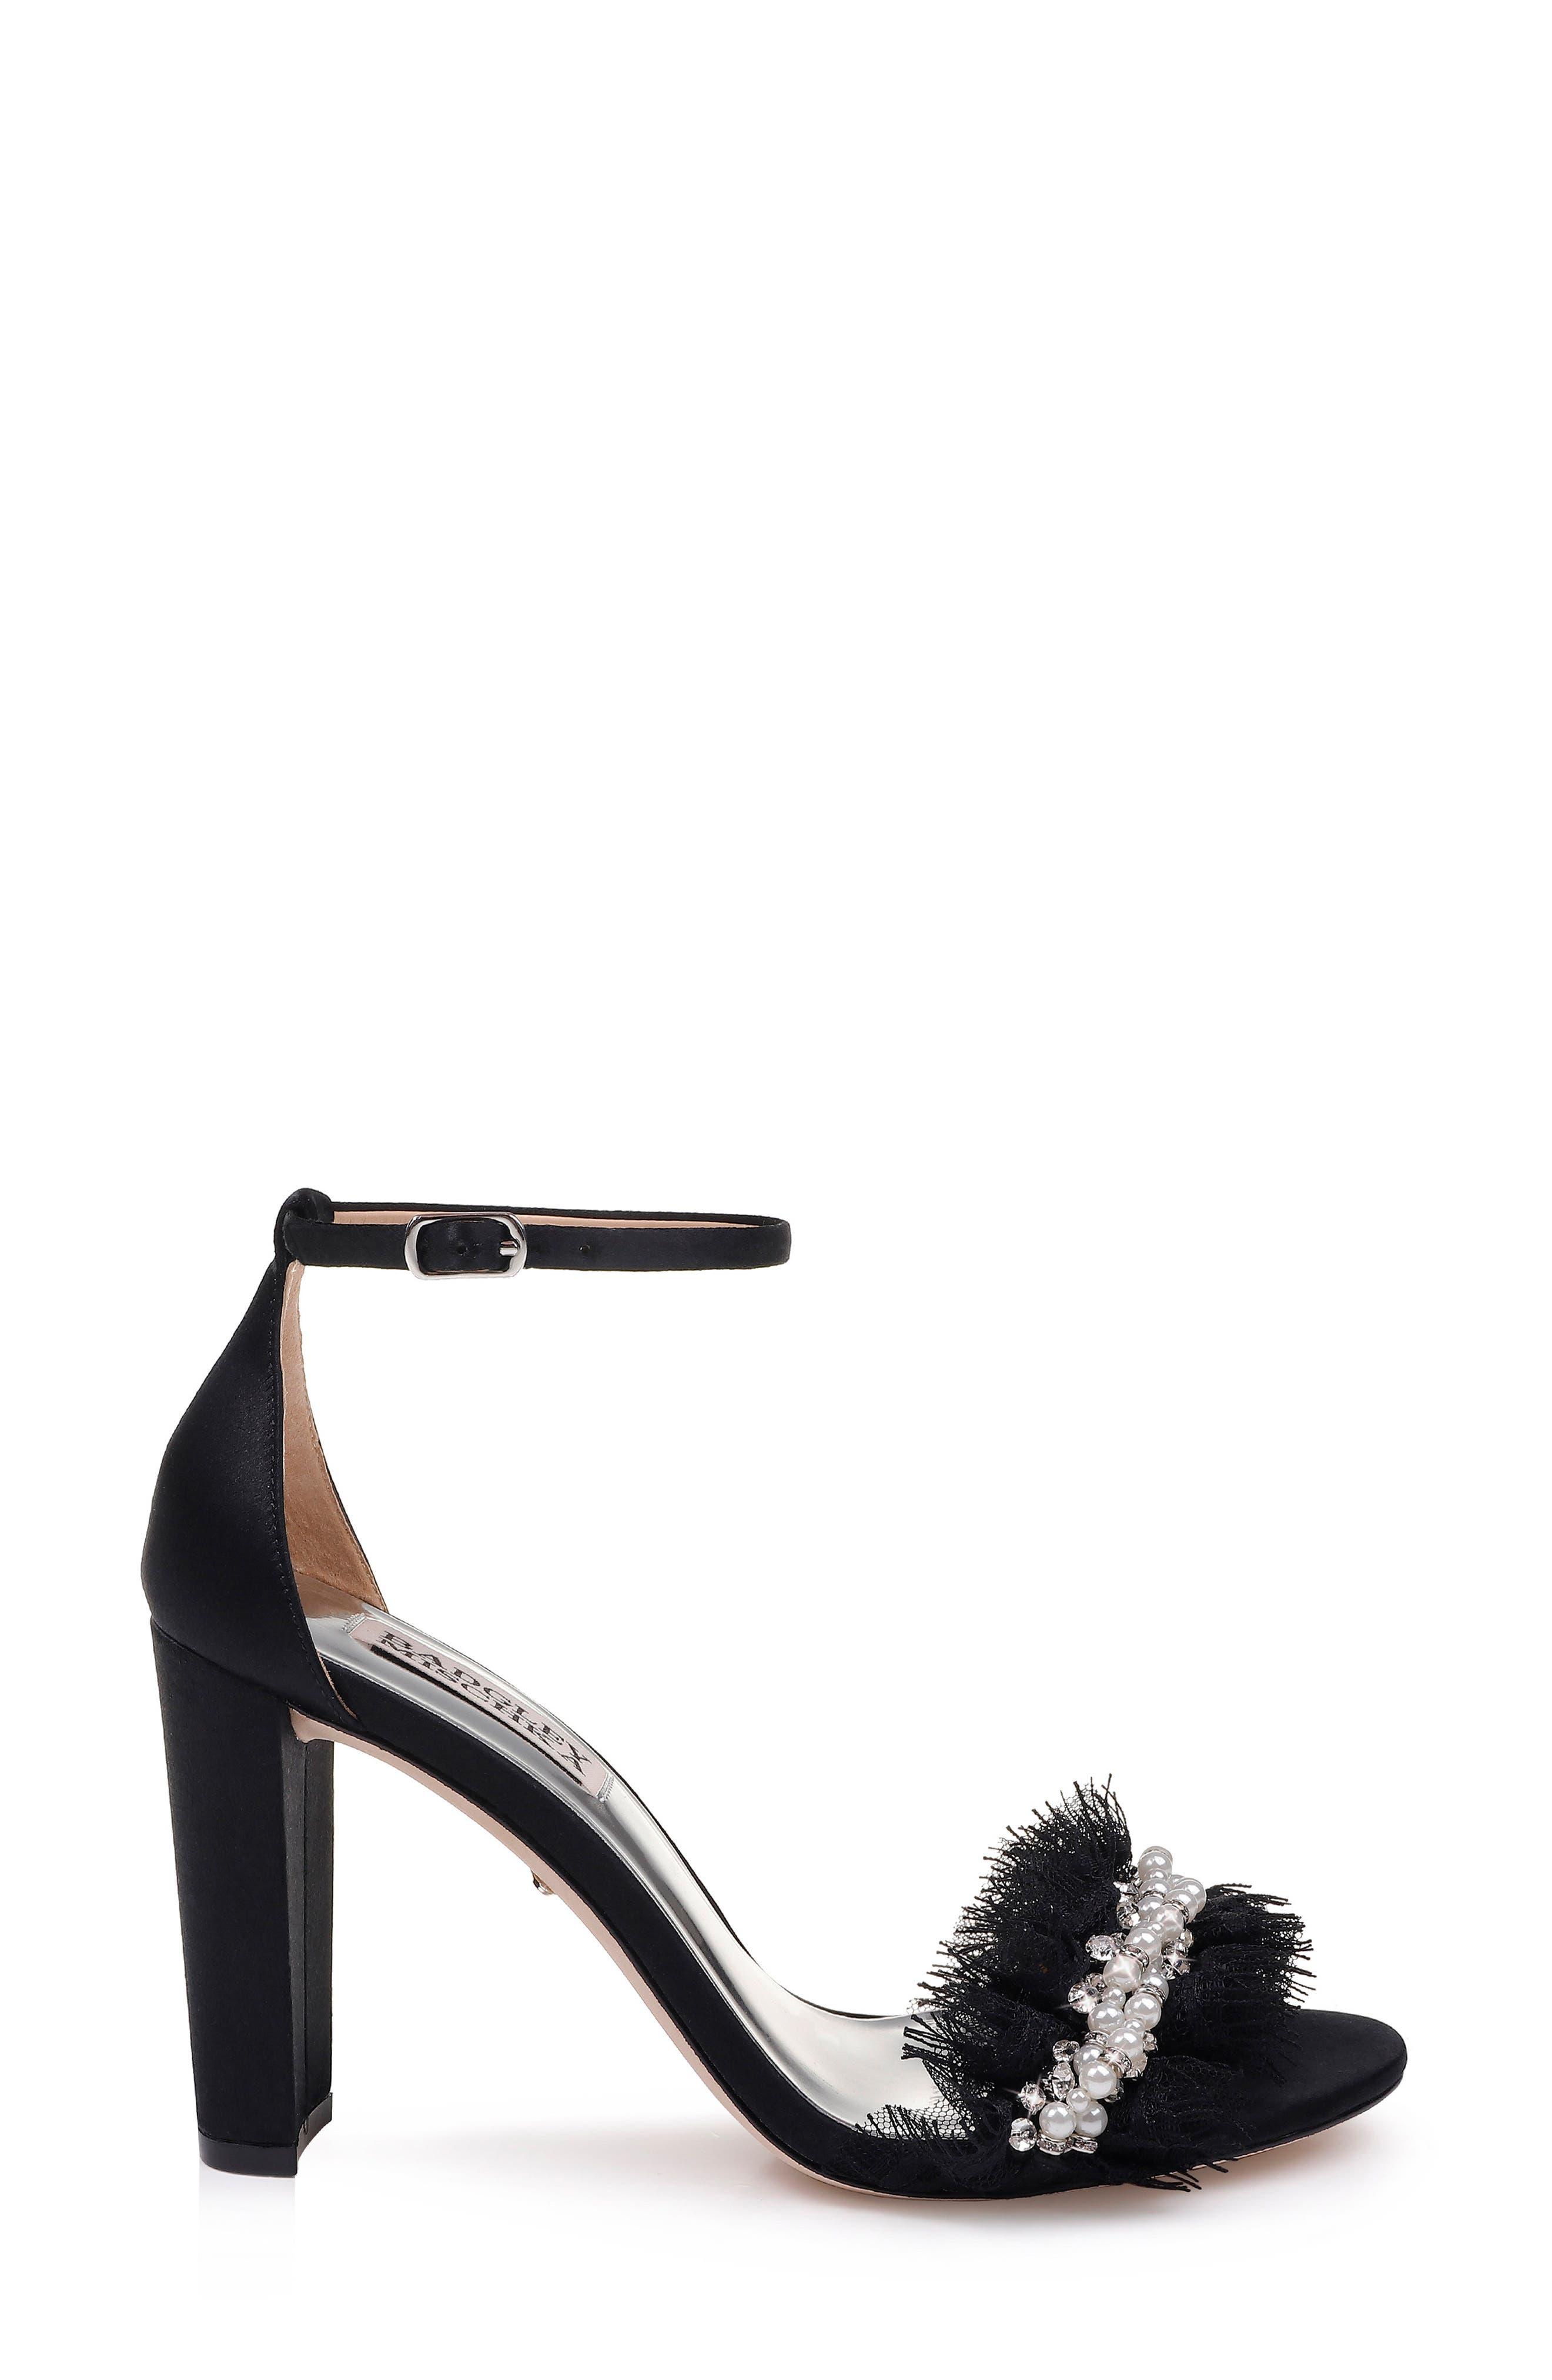 Badgley Mischka Fleur Ankle Strap Sandal,                             Alternate thumbnail 3, color,                             BLACK SATIN/ CHIFFON